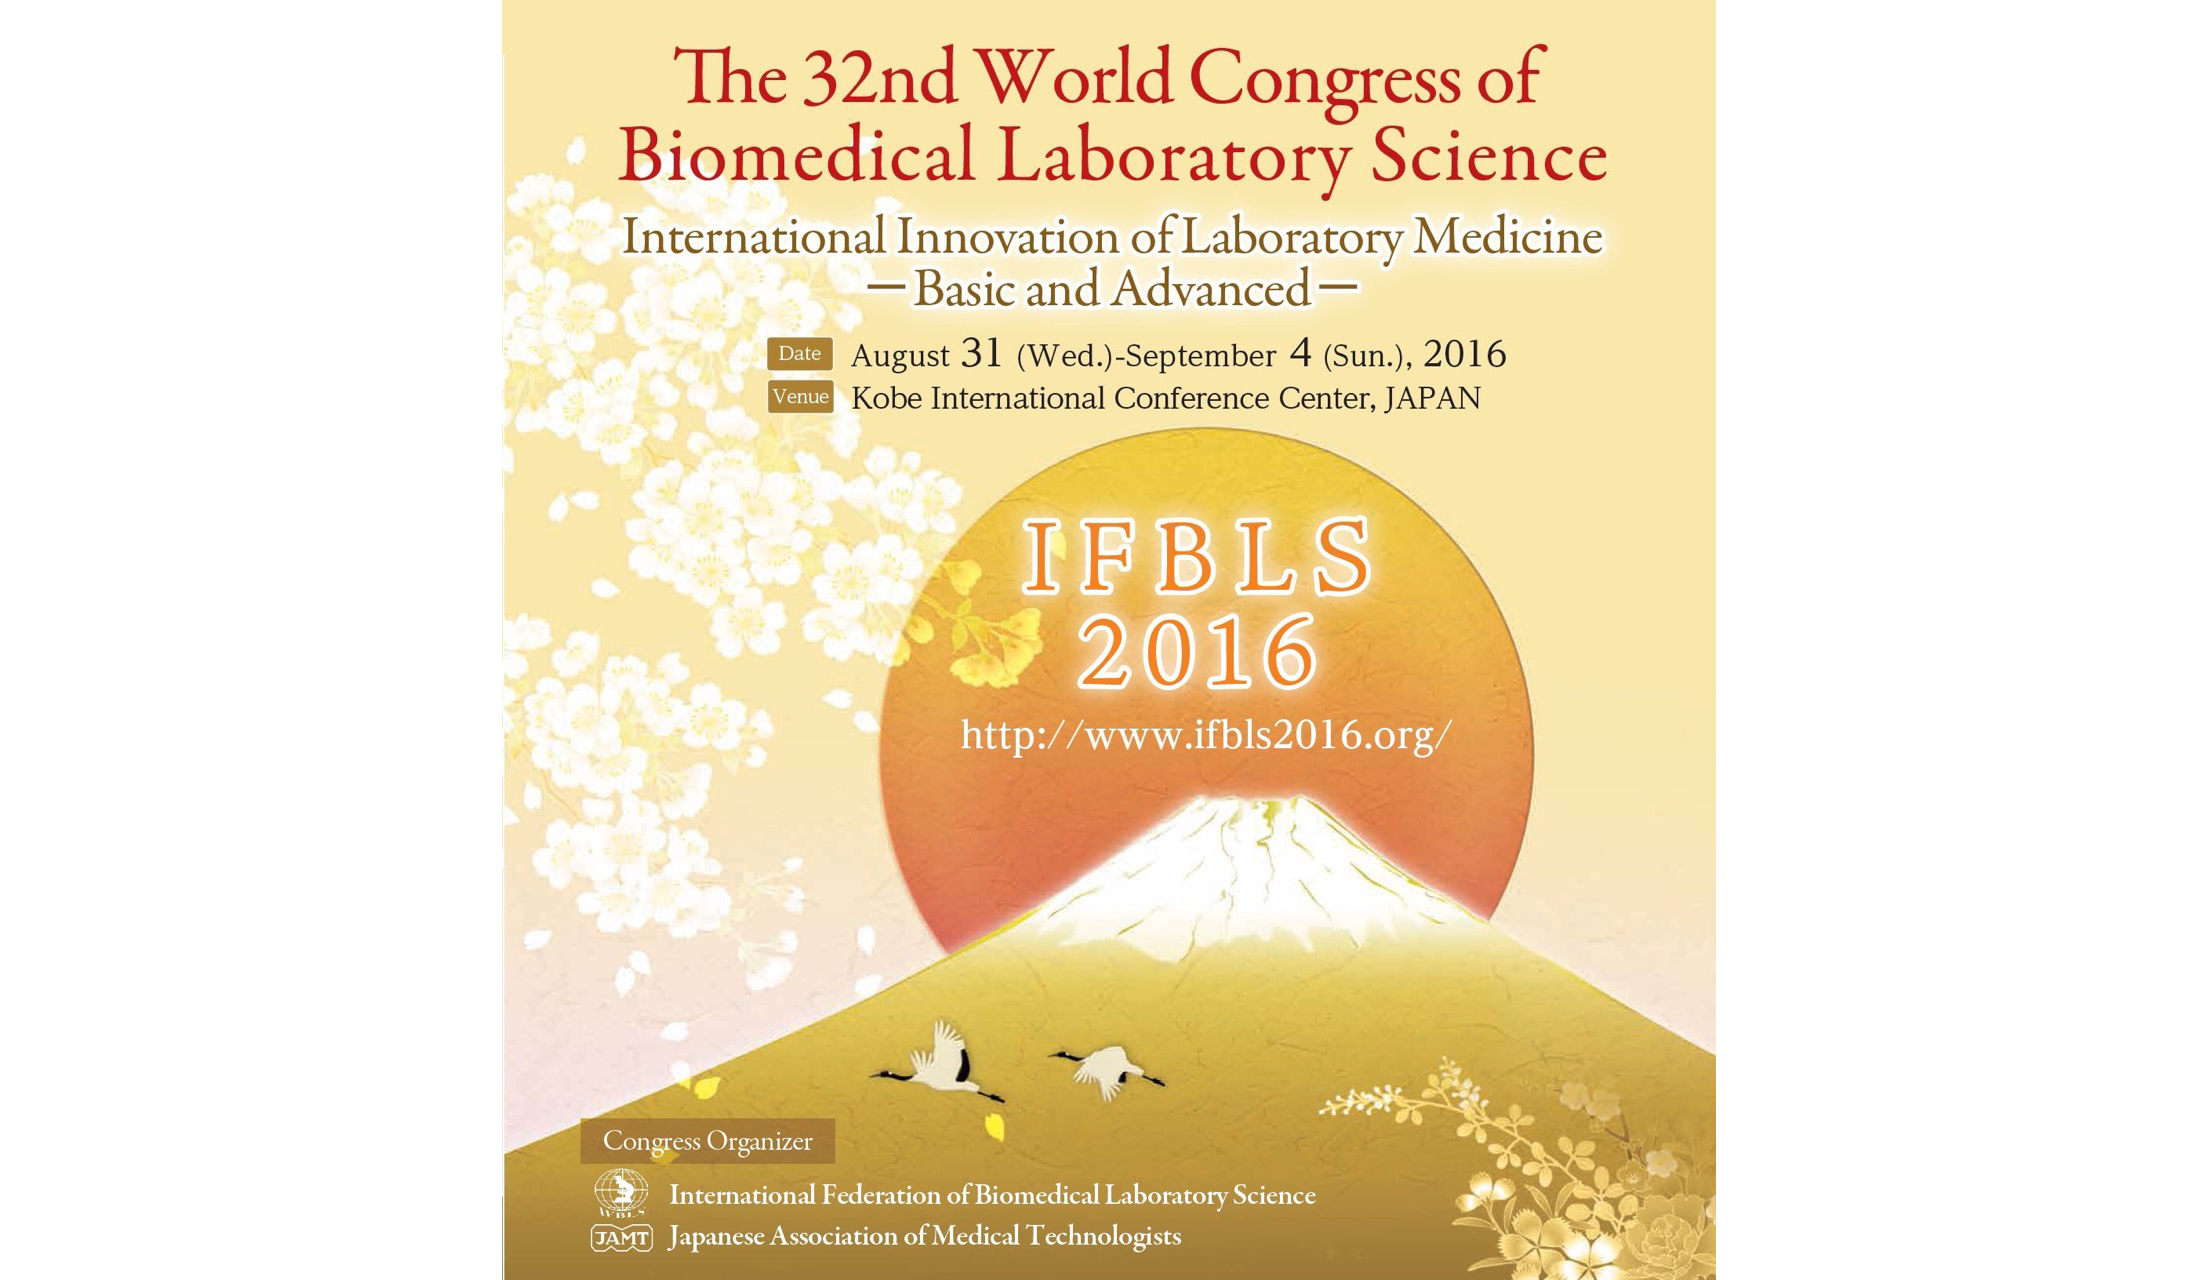 32nd World Congress of Biomedical Laboratory Science, Aug 31 - Sep 4, 2016, Kobe, Japan,